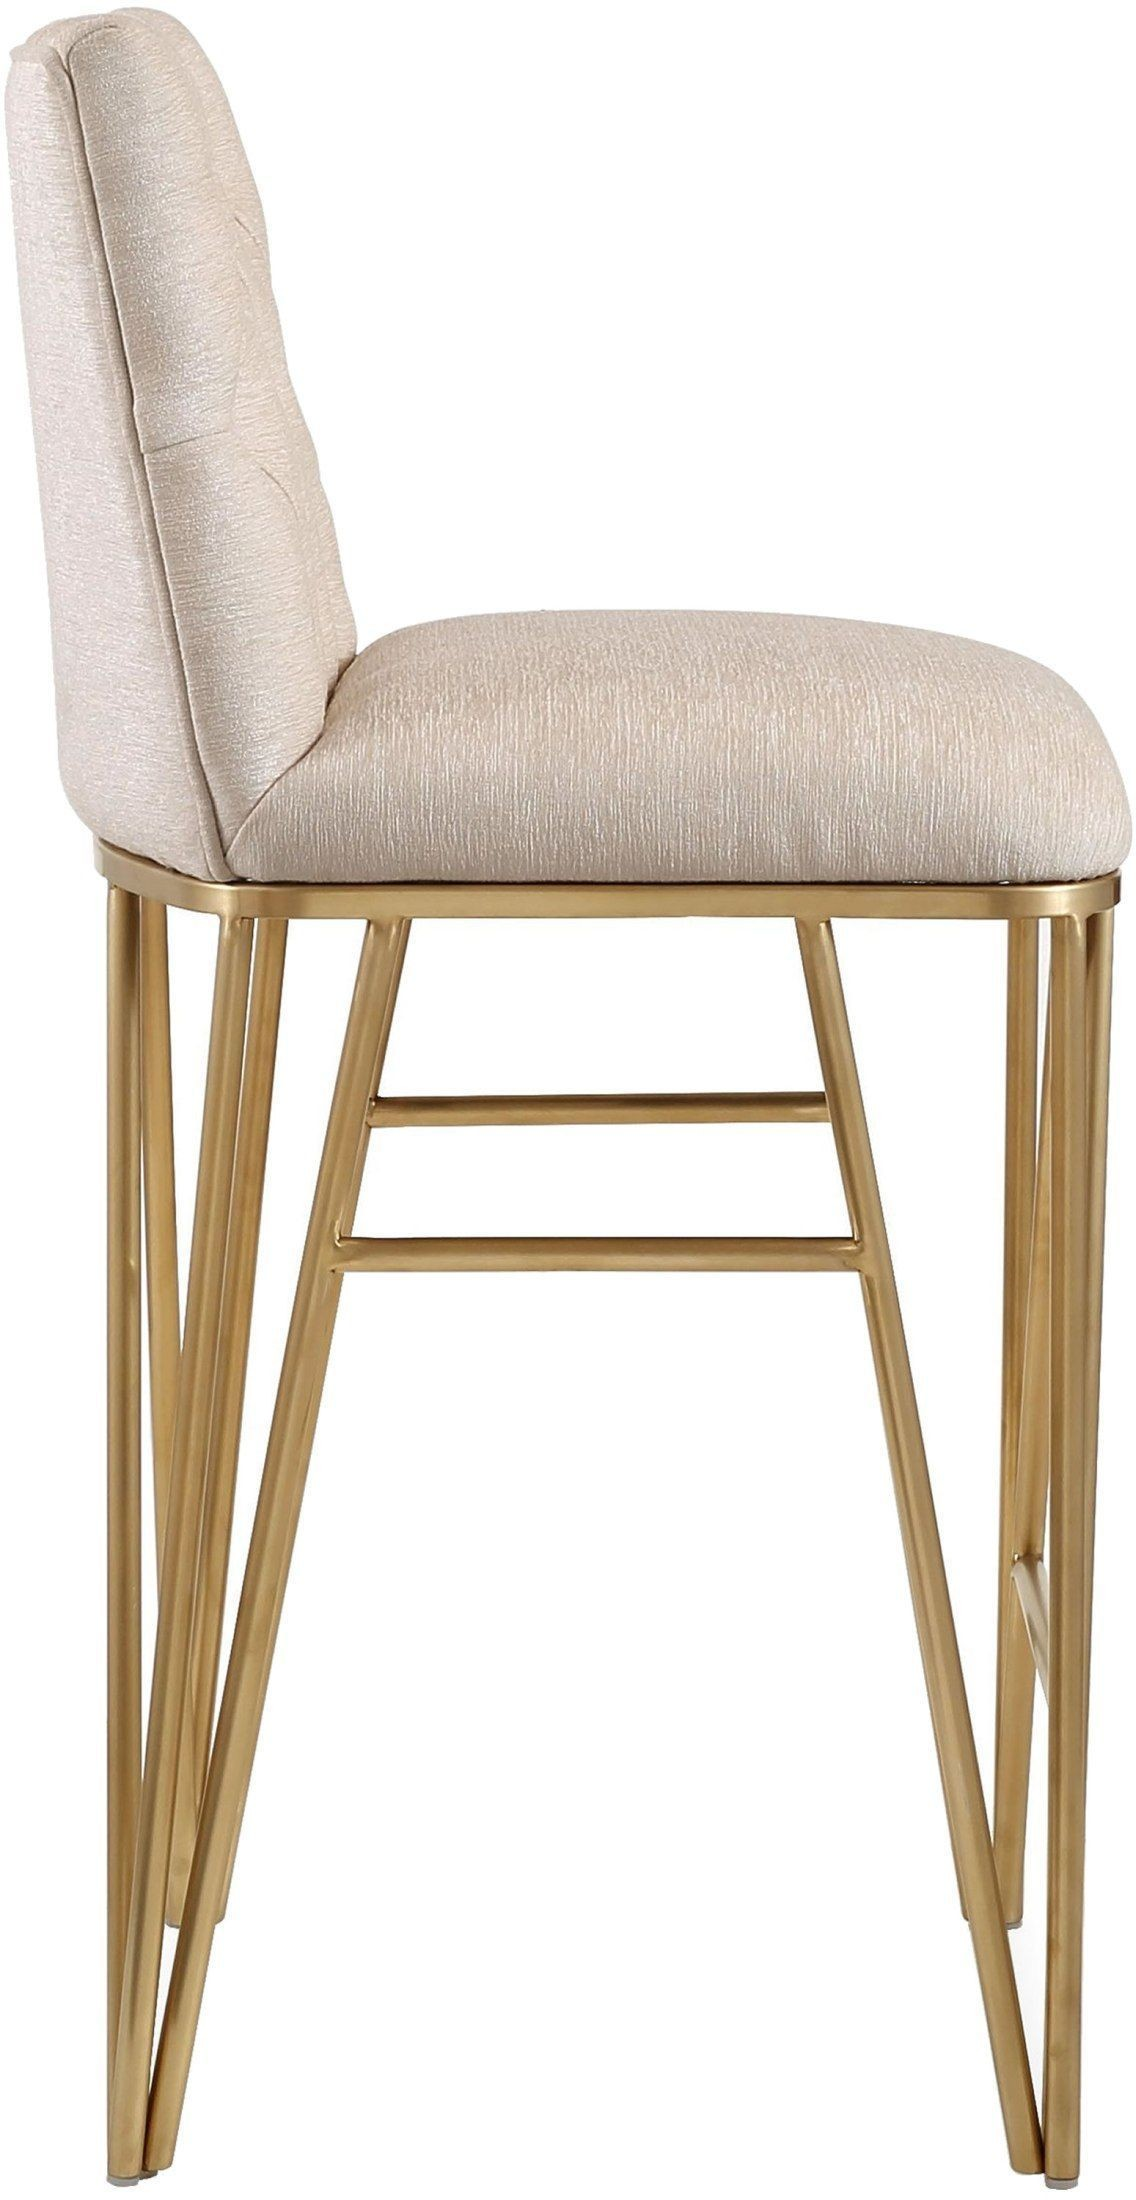 Lexi Cream Textured Velvet Bar Stool D3730 TOV Furniture : tov d37302tov from colemanfurniture.com size 1136 x 2200 jpeg 263kB